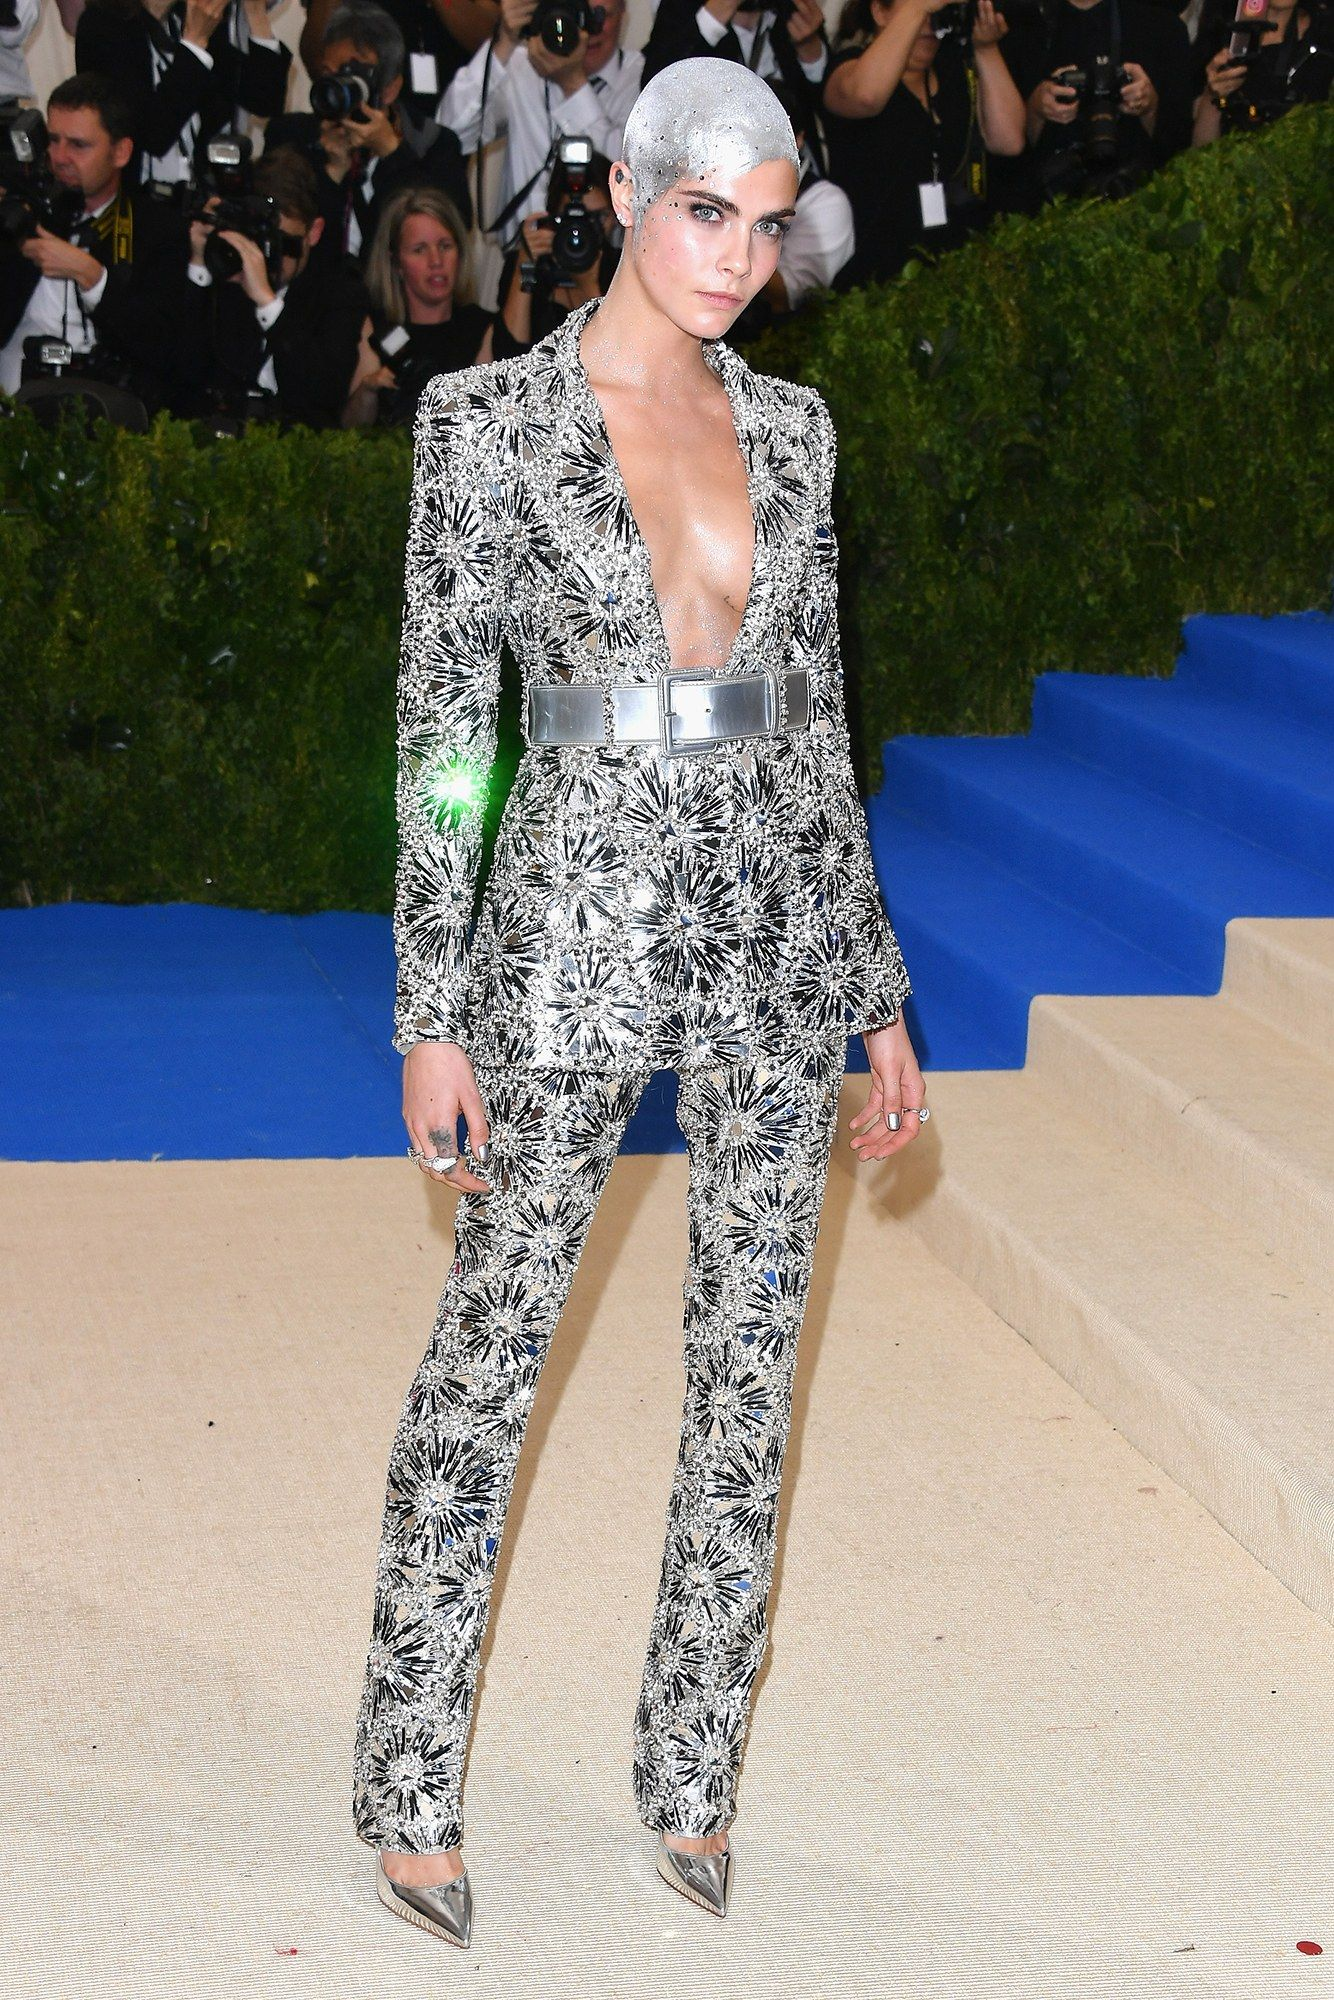 Met Gala 2017: The Best-Dressed Celebrities | Fashion | Pinterest ...